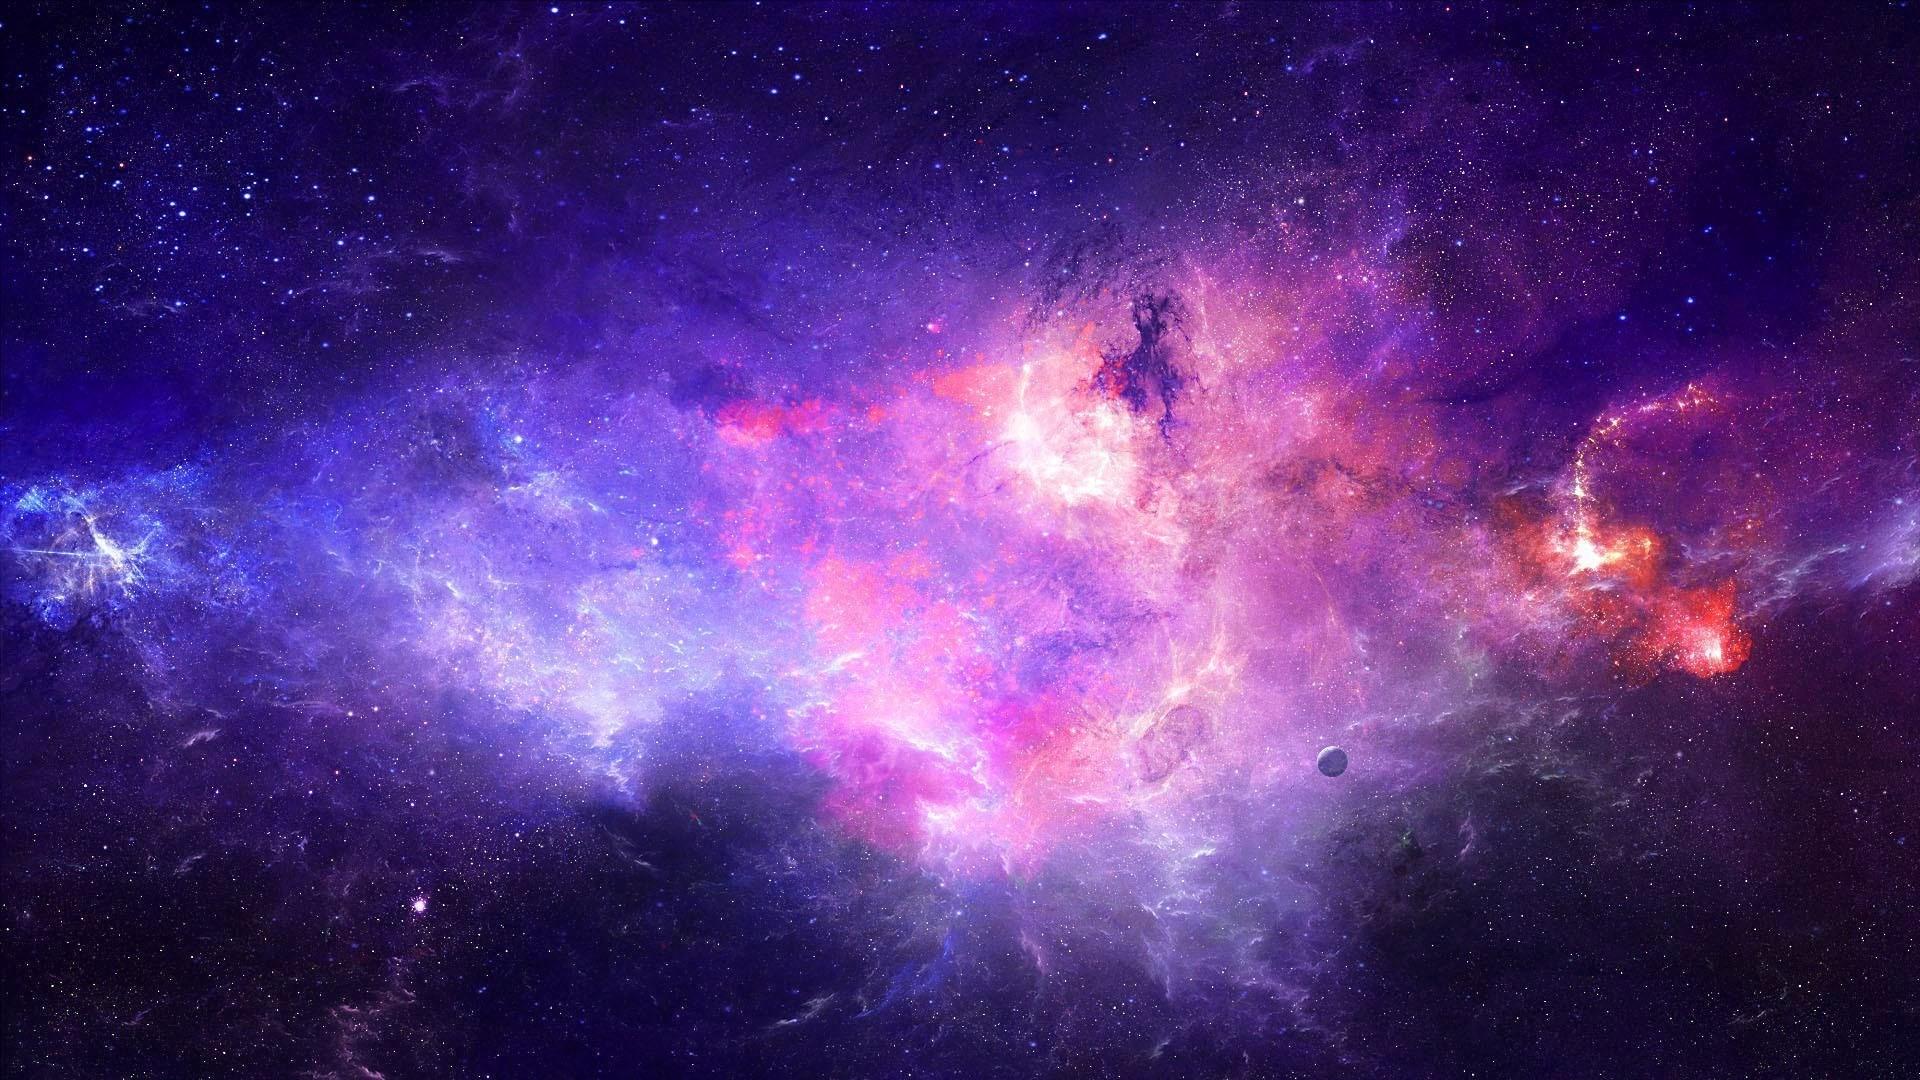 Hd Purple Space Wallpaper 65 Images